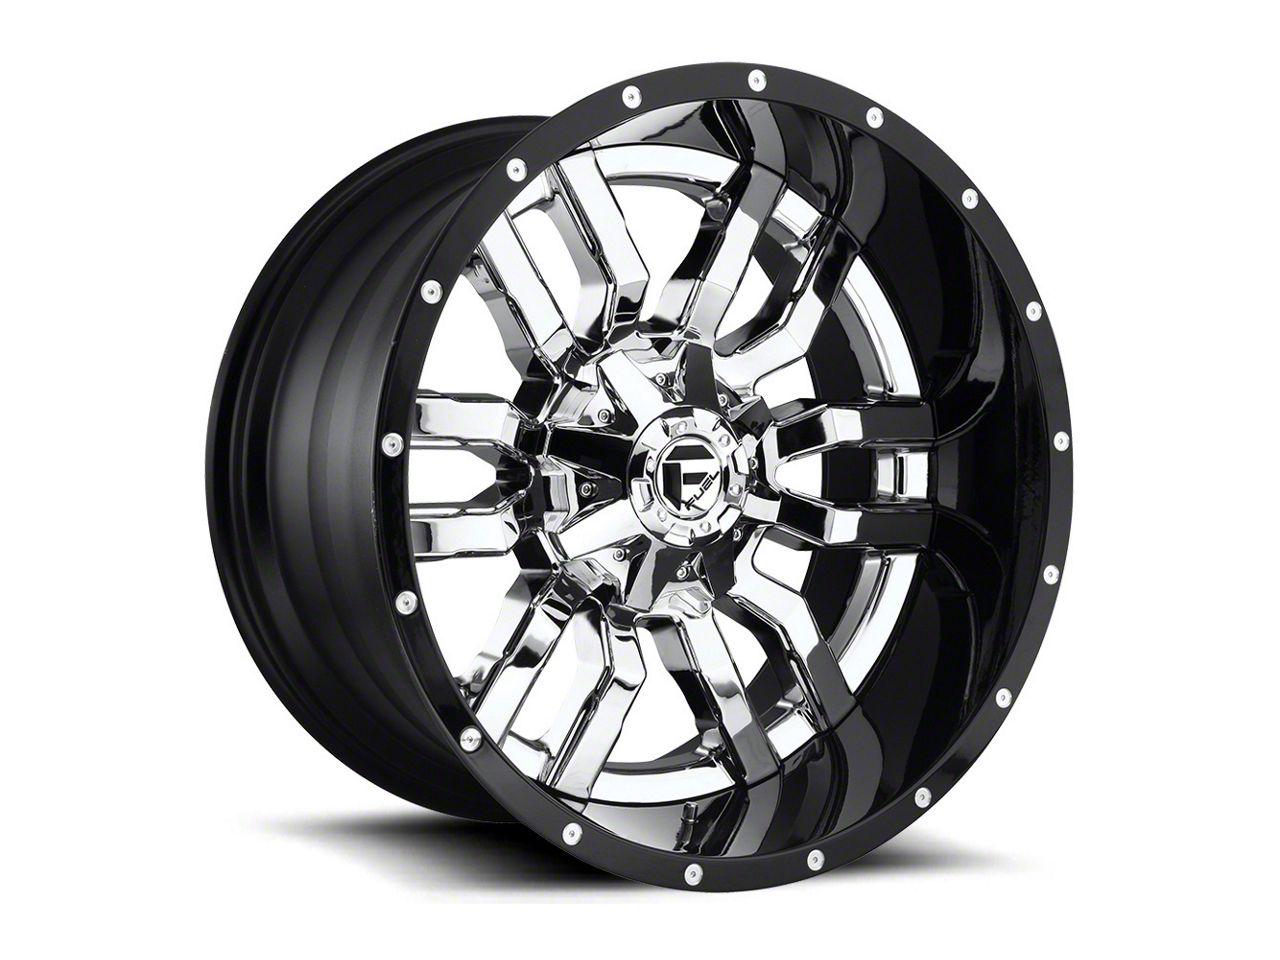 Fuel Wheels Sledge Chrome 6-Lug Wheel - 22x14 (07-18 Sierra 1500)